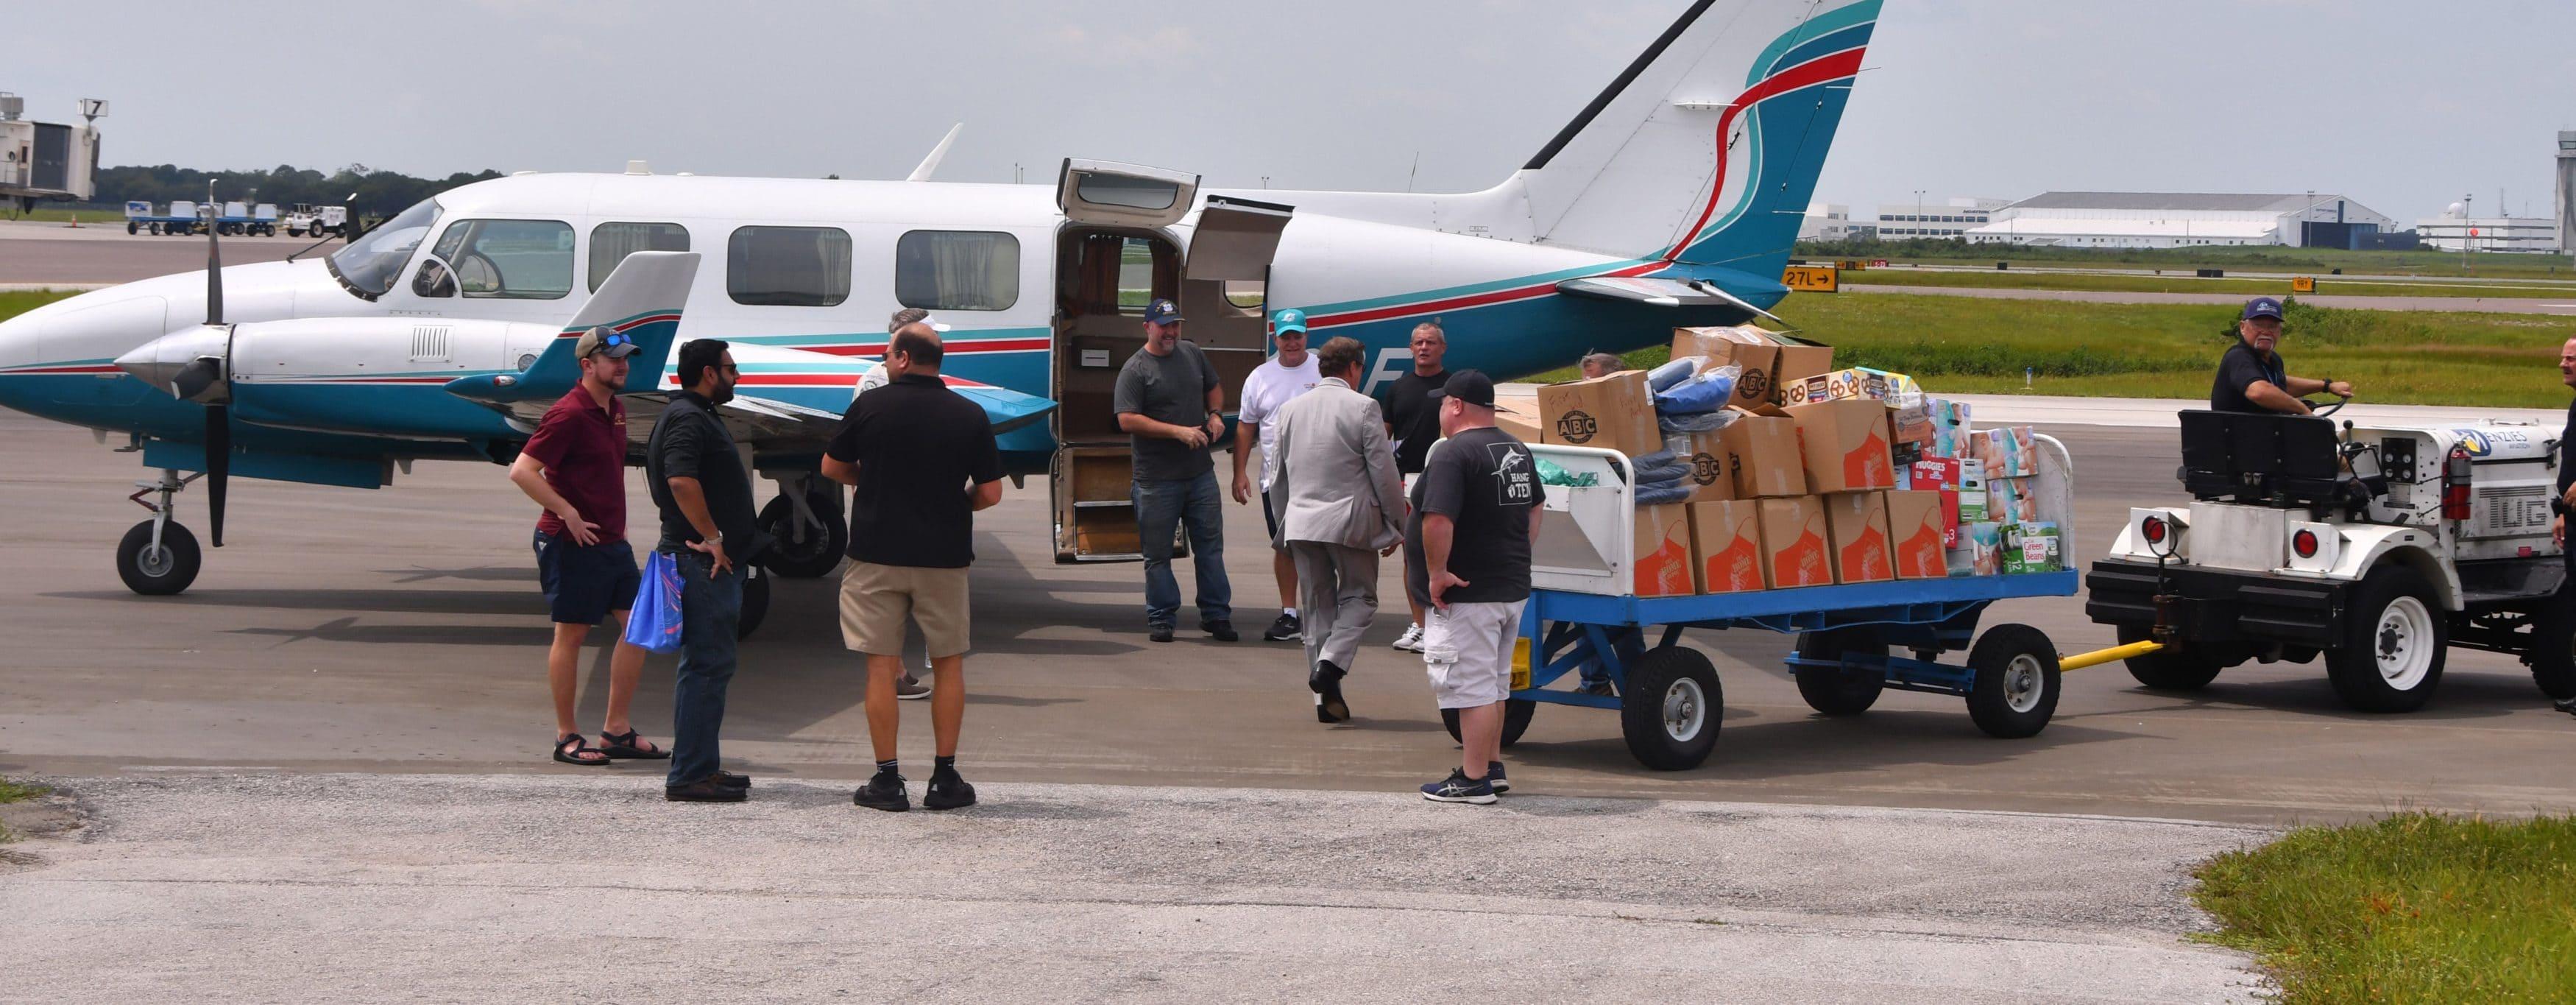 7e086013-bcf3-498d-9c9a-041ac6ee84ff-Florida_Tech_sends_supoolies_to_Bahamas_18-3500x1365.jpg